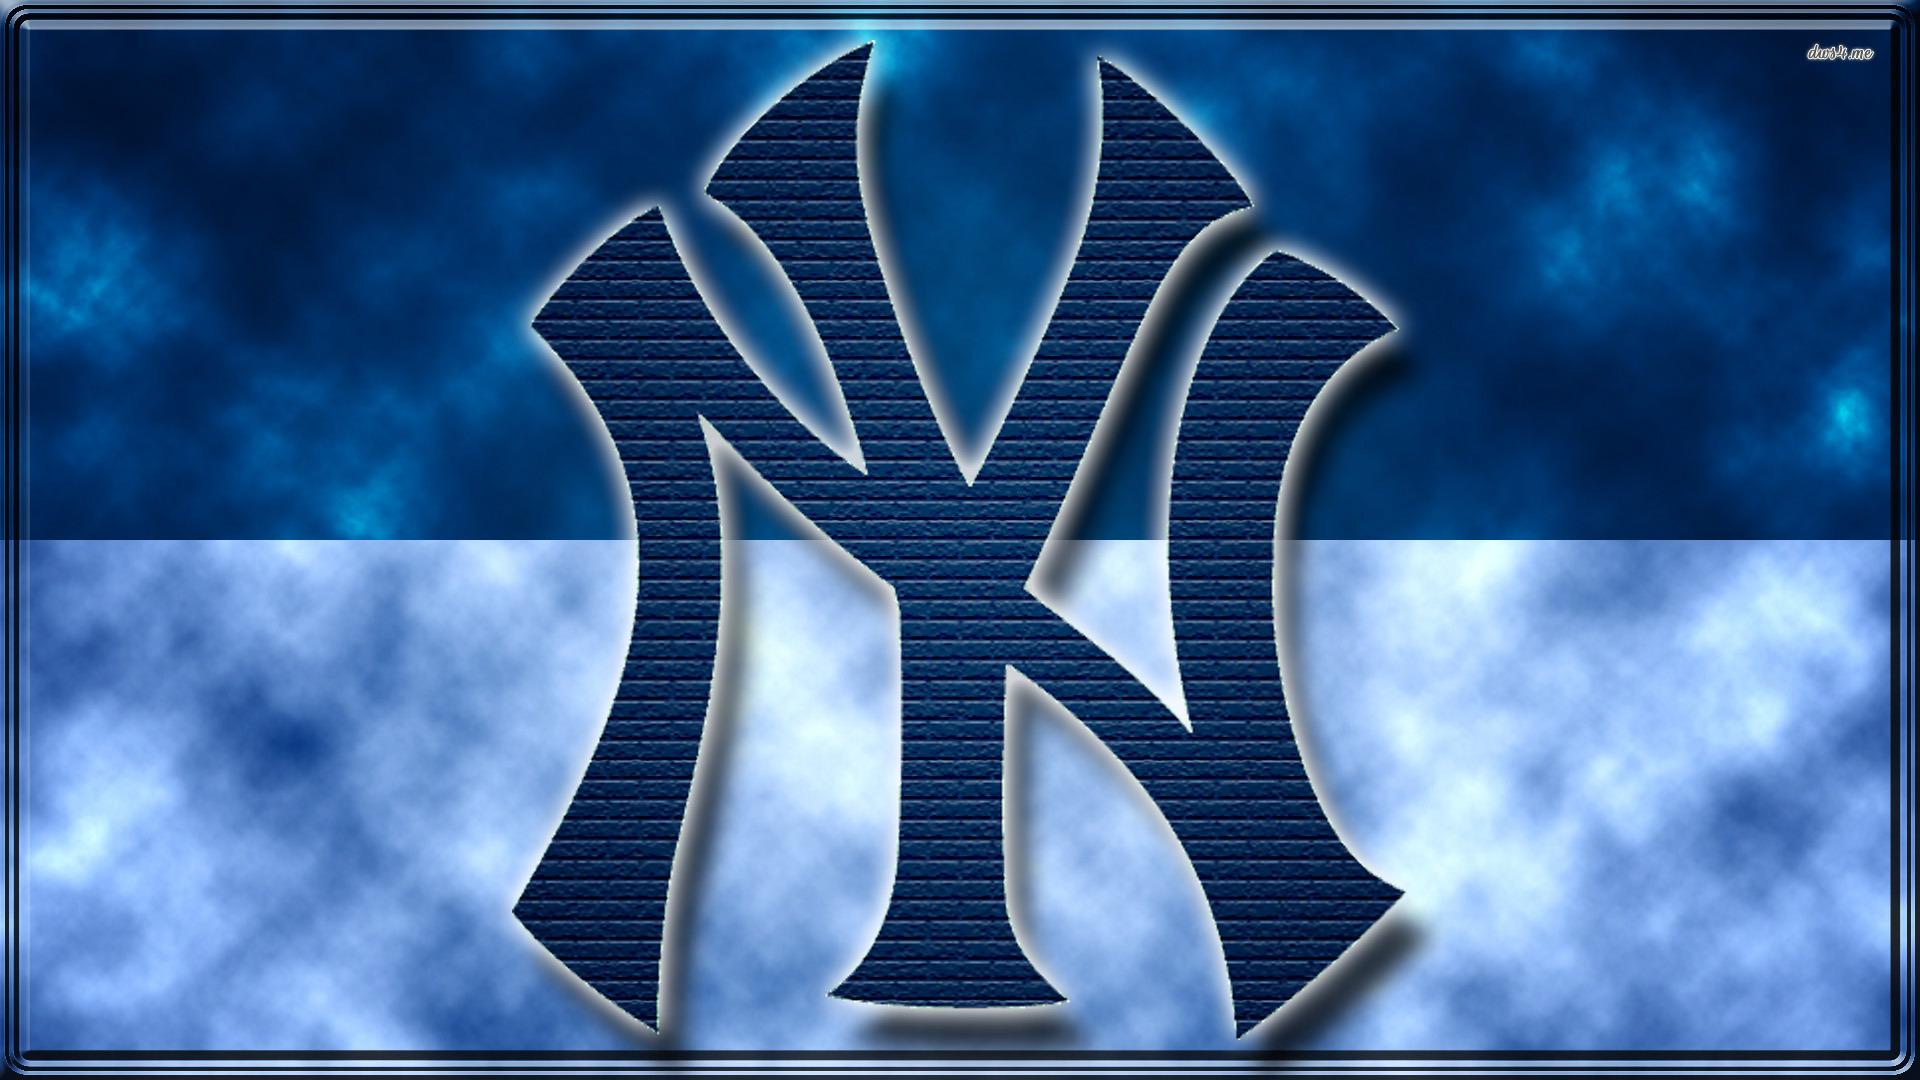 New York Yankees Wallpaper - New York Yankees Cool , HD Wallpaper & Backgrounds